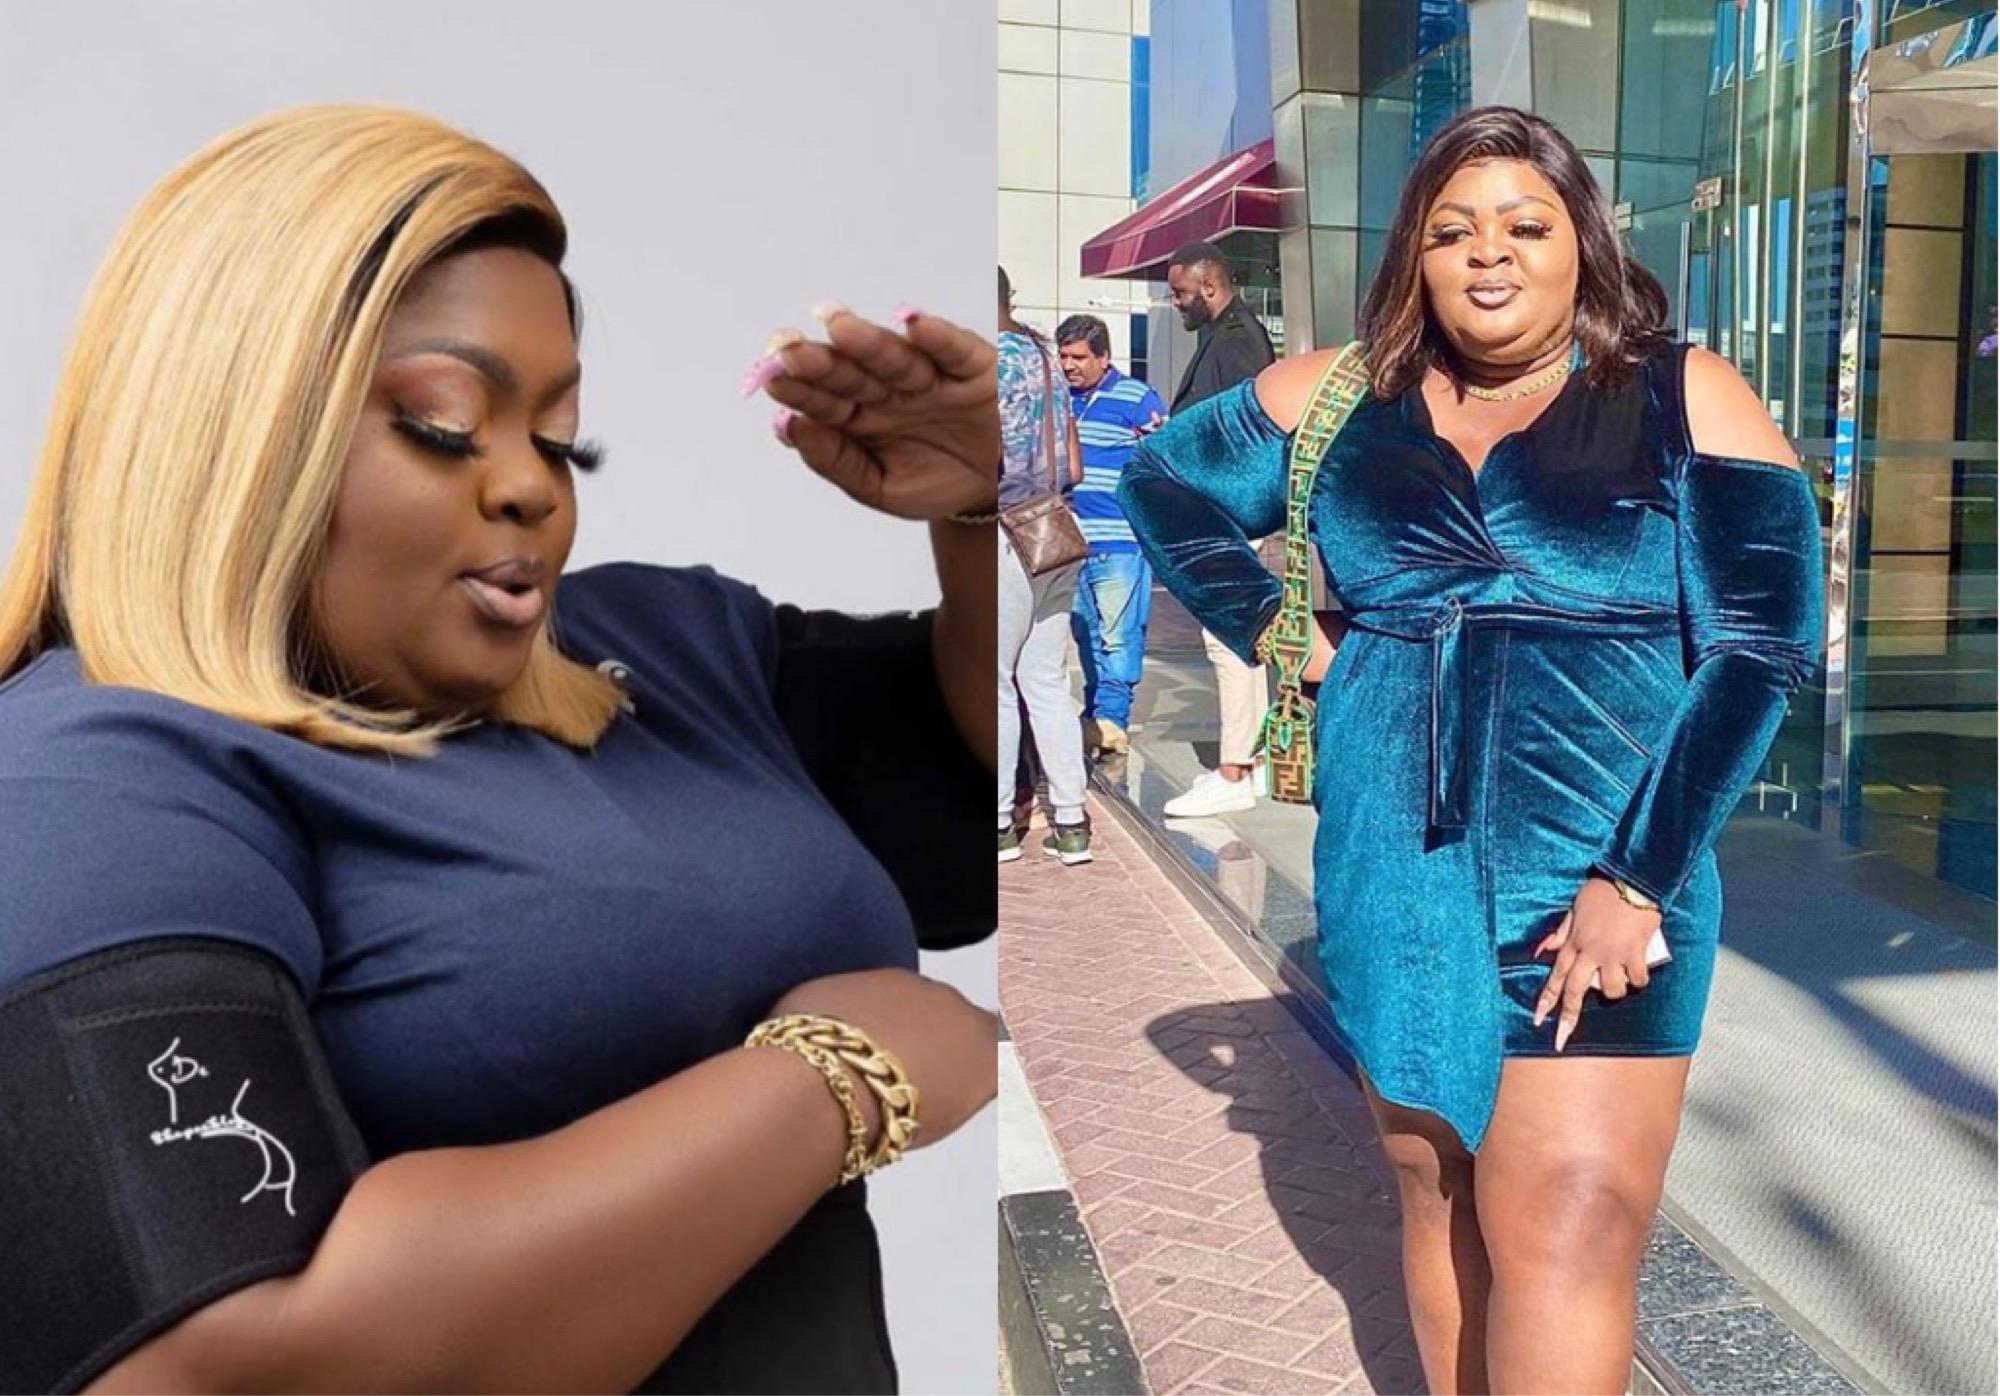 Actress Eniola Badmus, Fan Clash Over 'Photoshopped Instagram Images'